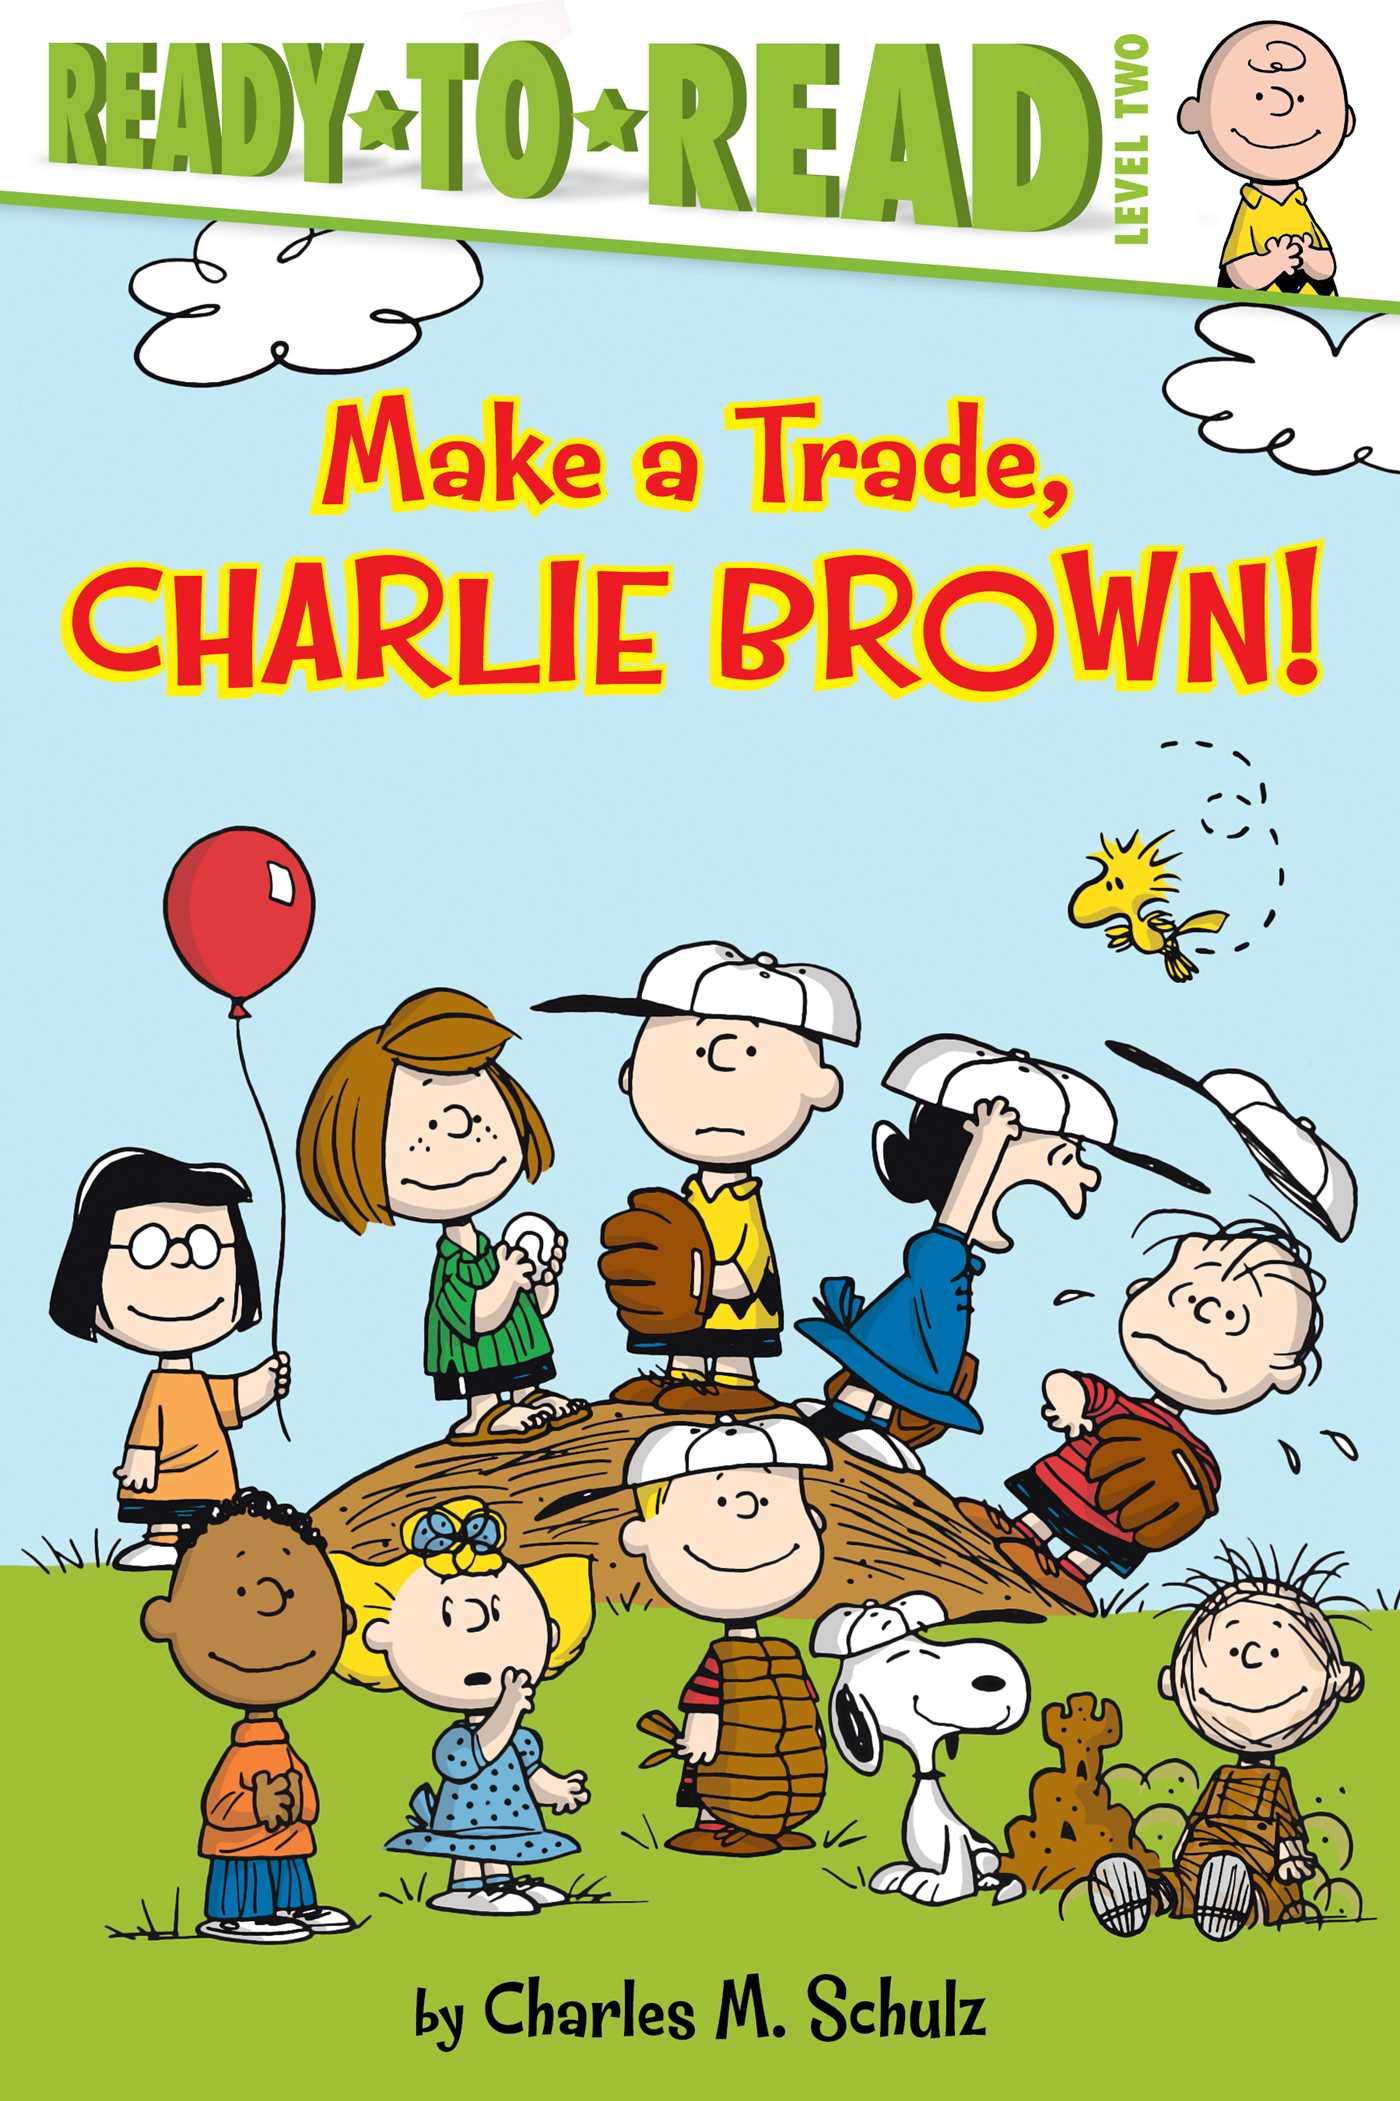 Make a trade charlie brown 9781481456876 hr